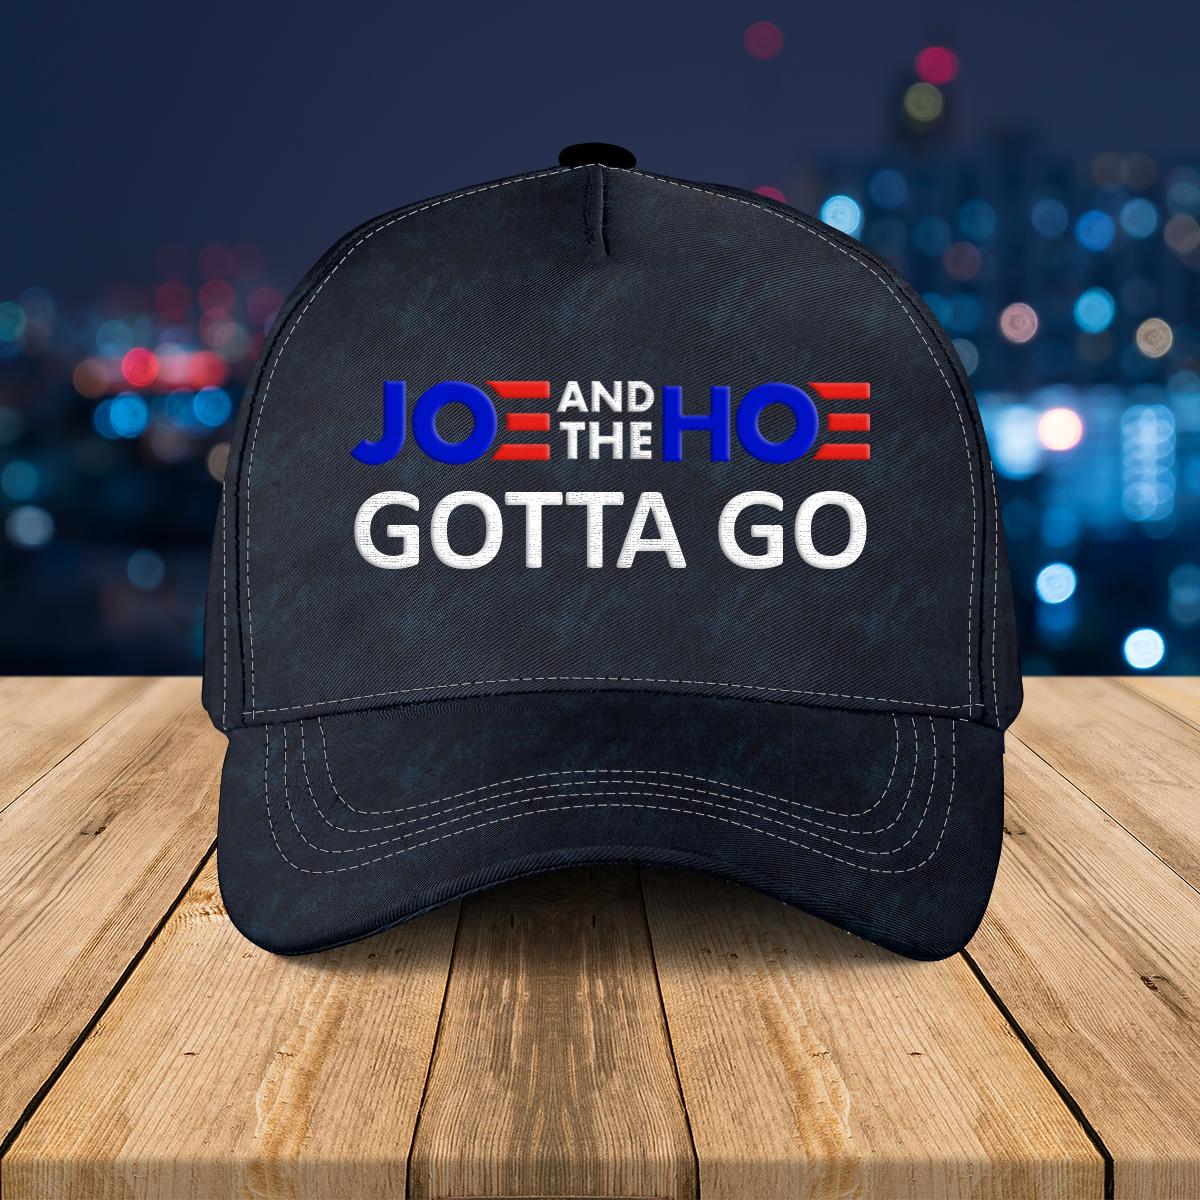 3 Joe and the Hoe gotta go hat 1 1